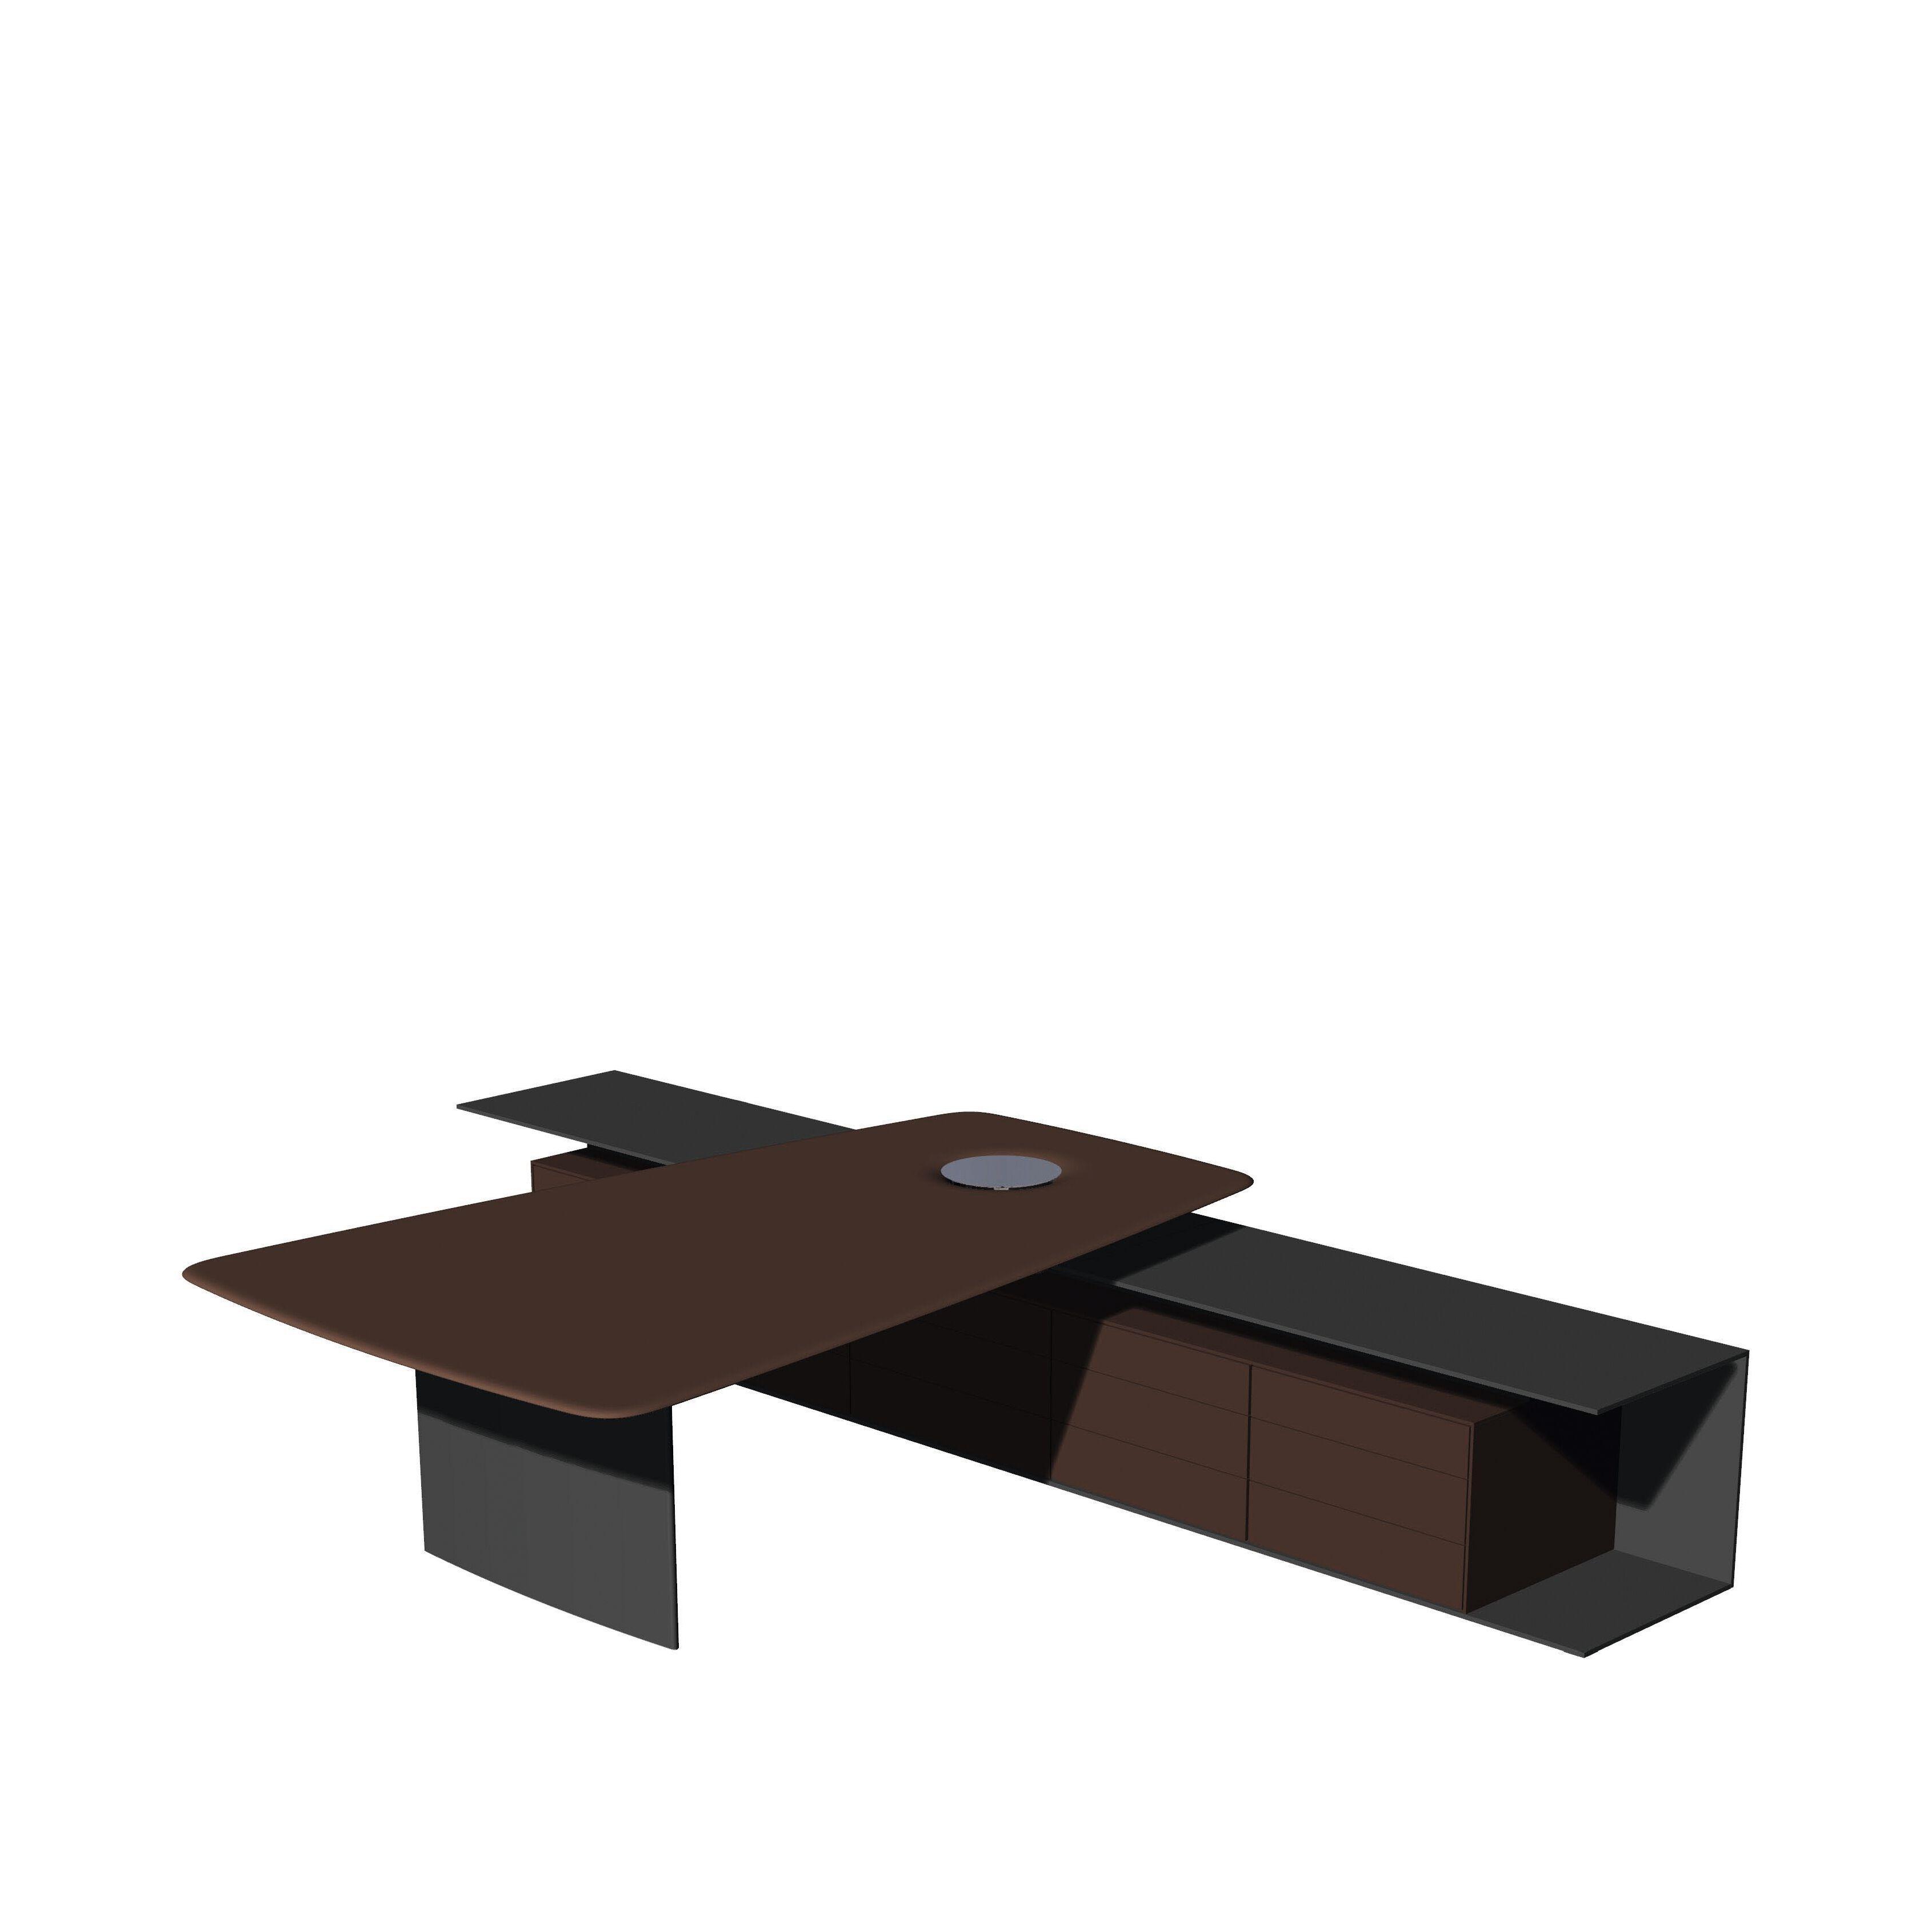 01-WK-Keypiece_Communication_Desk-0036-H.tif